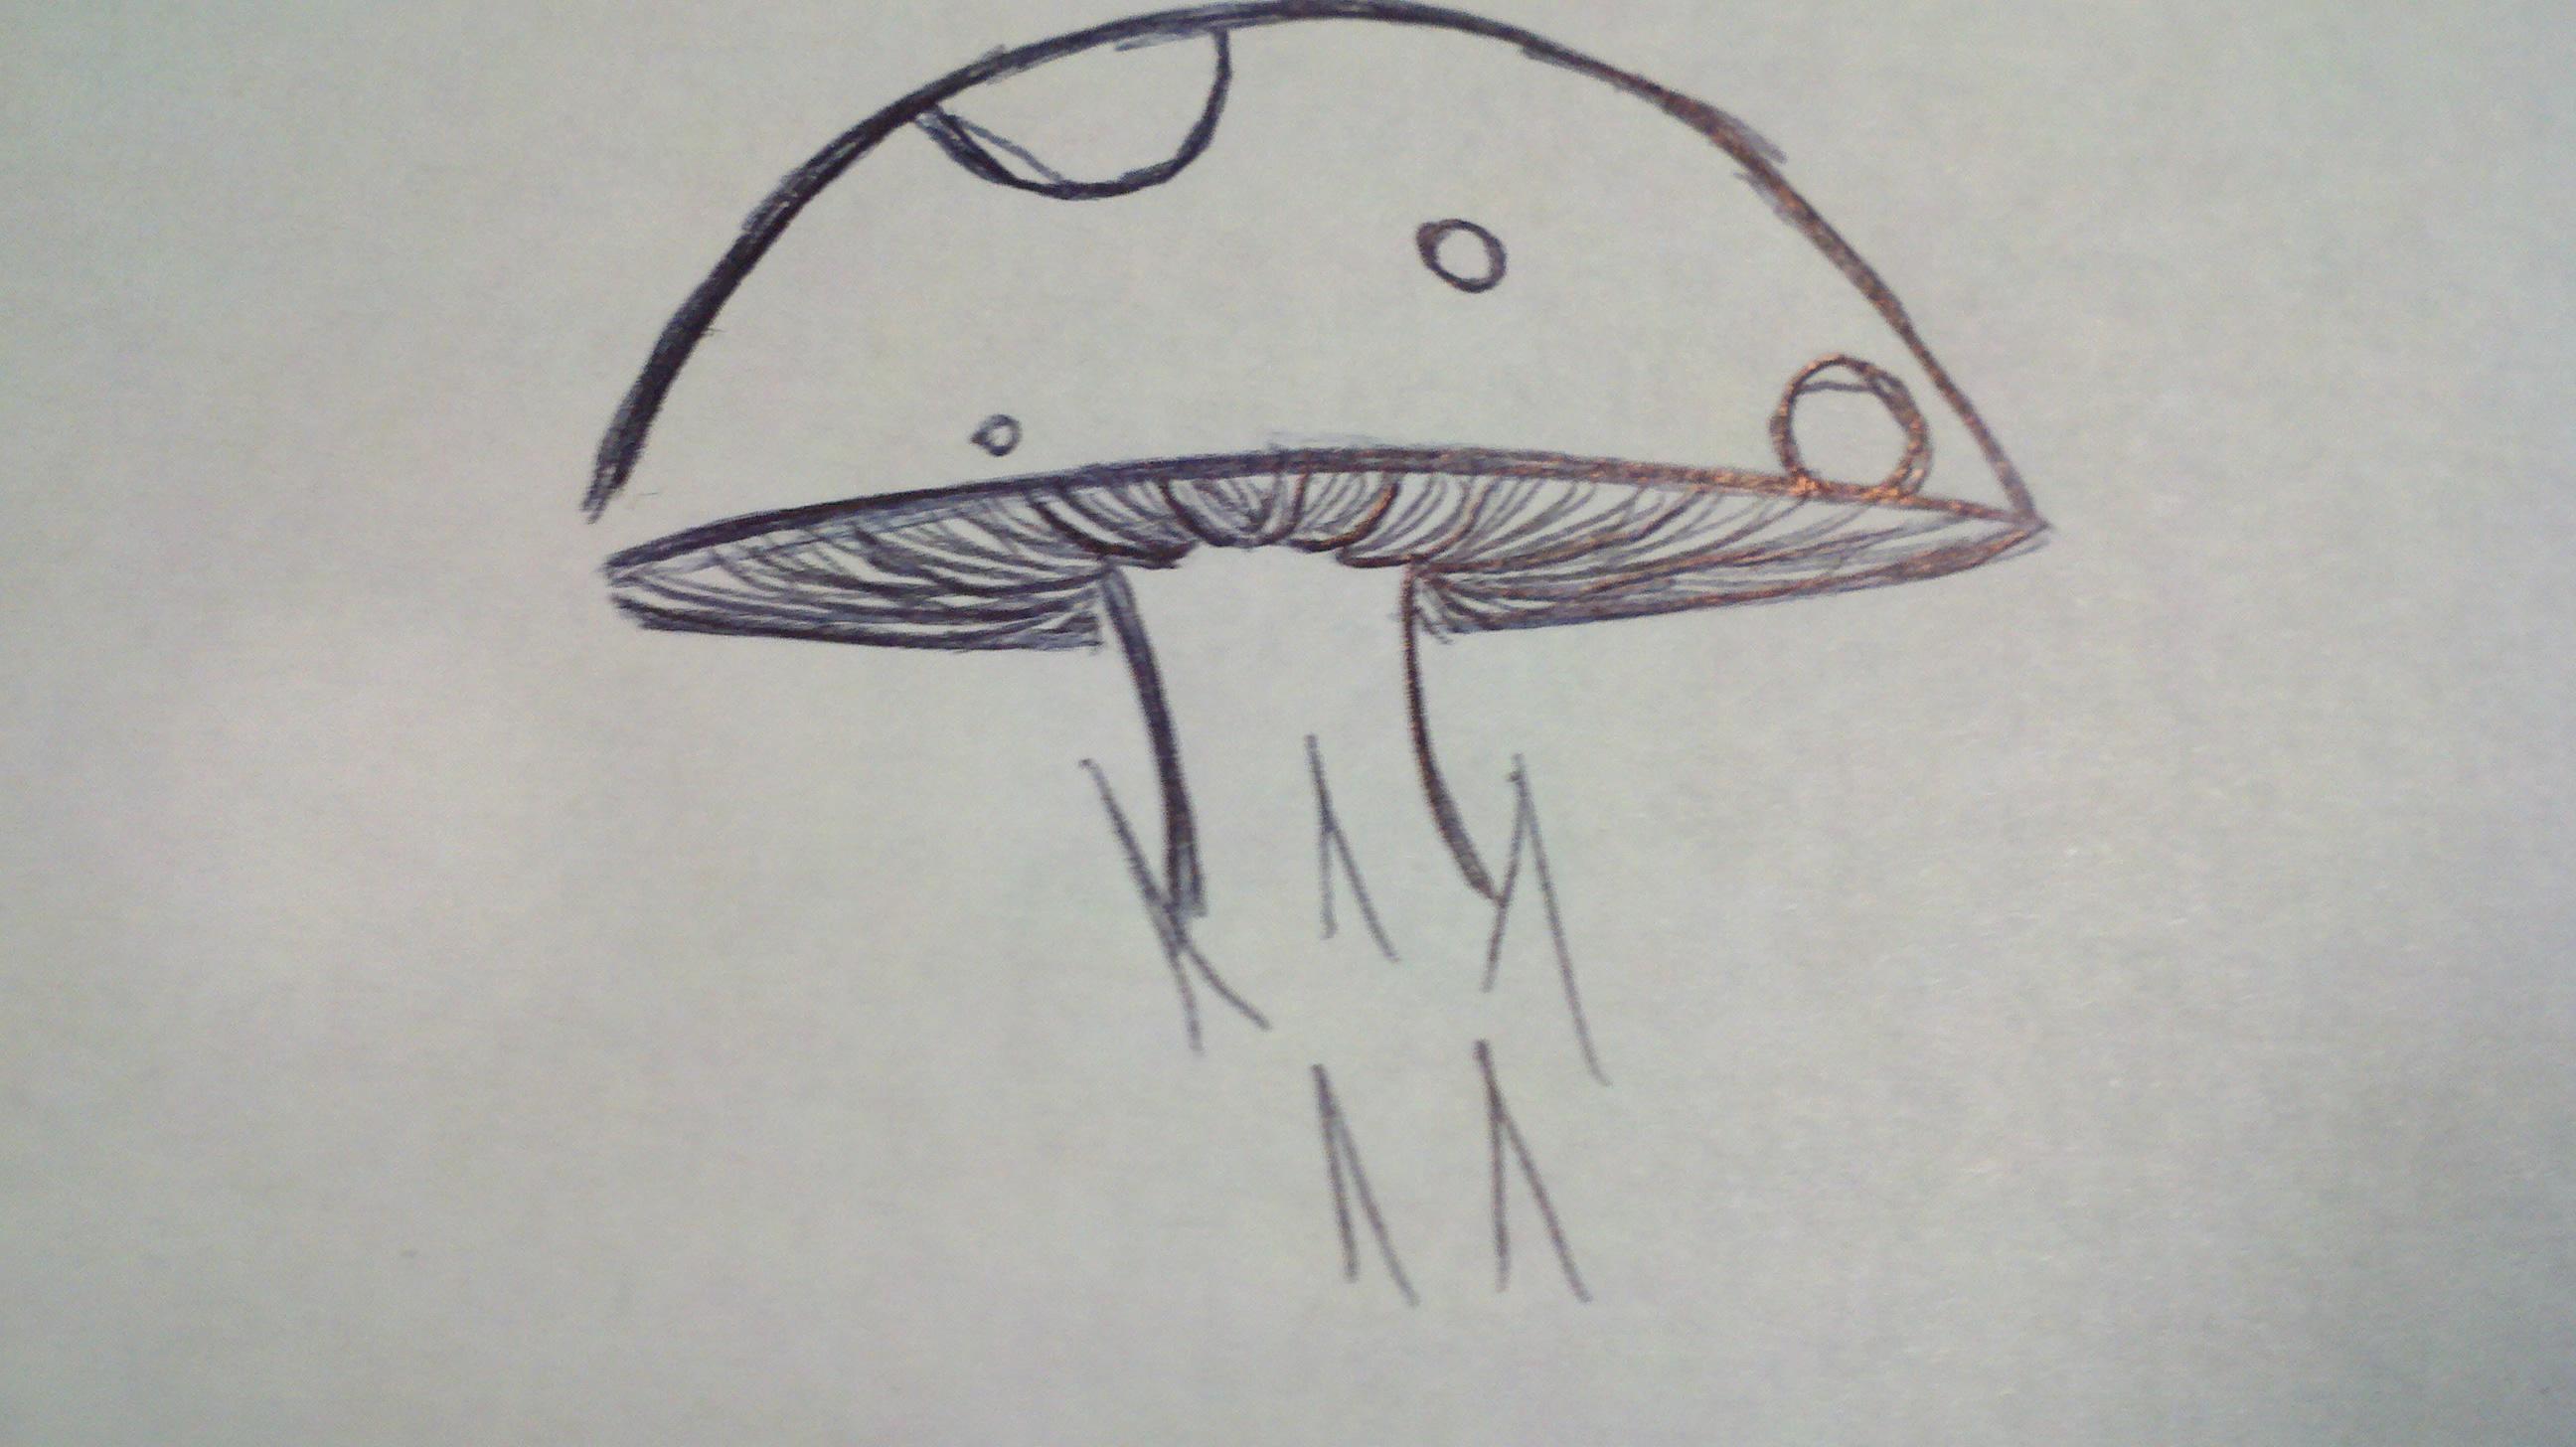 Drawn mushroom alice in wonderland mushroom To papercanyons How A Mushroom